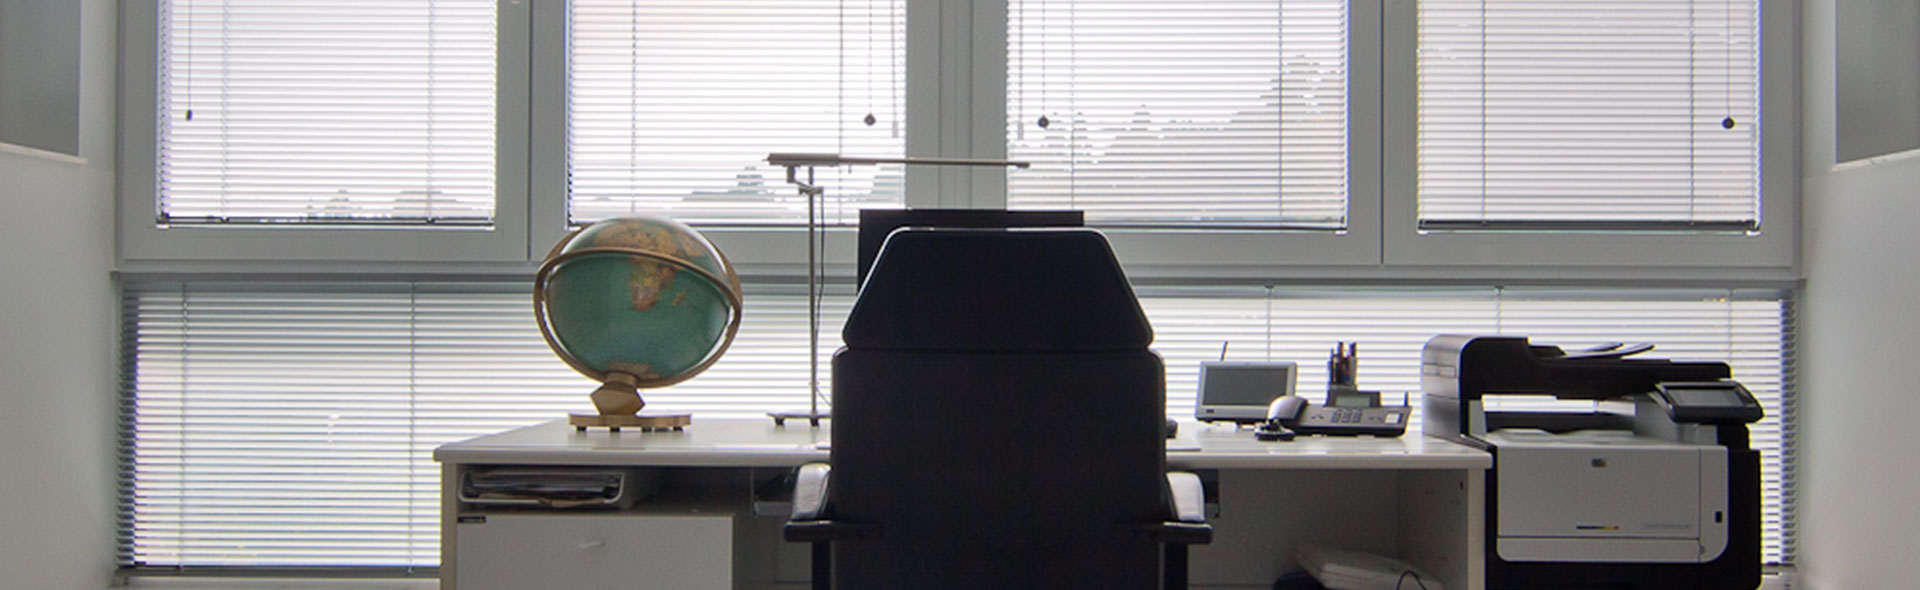 balkon zu wintergarten umbau im 6 stock stuttgart. Black Bedroom Furniture Sets. Home Design Ideas